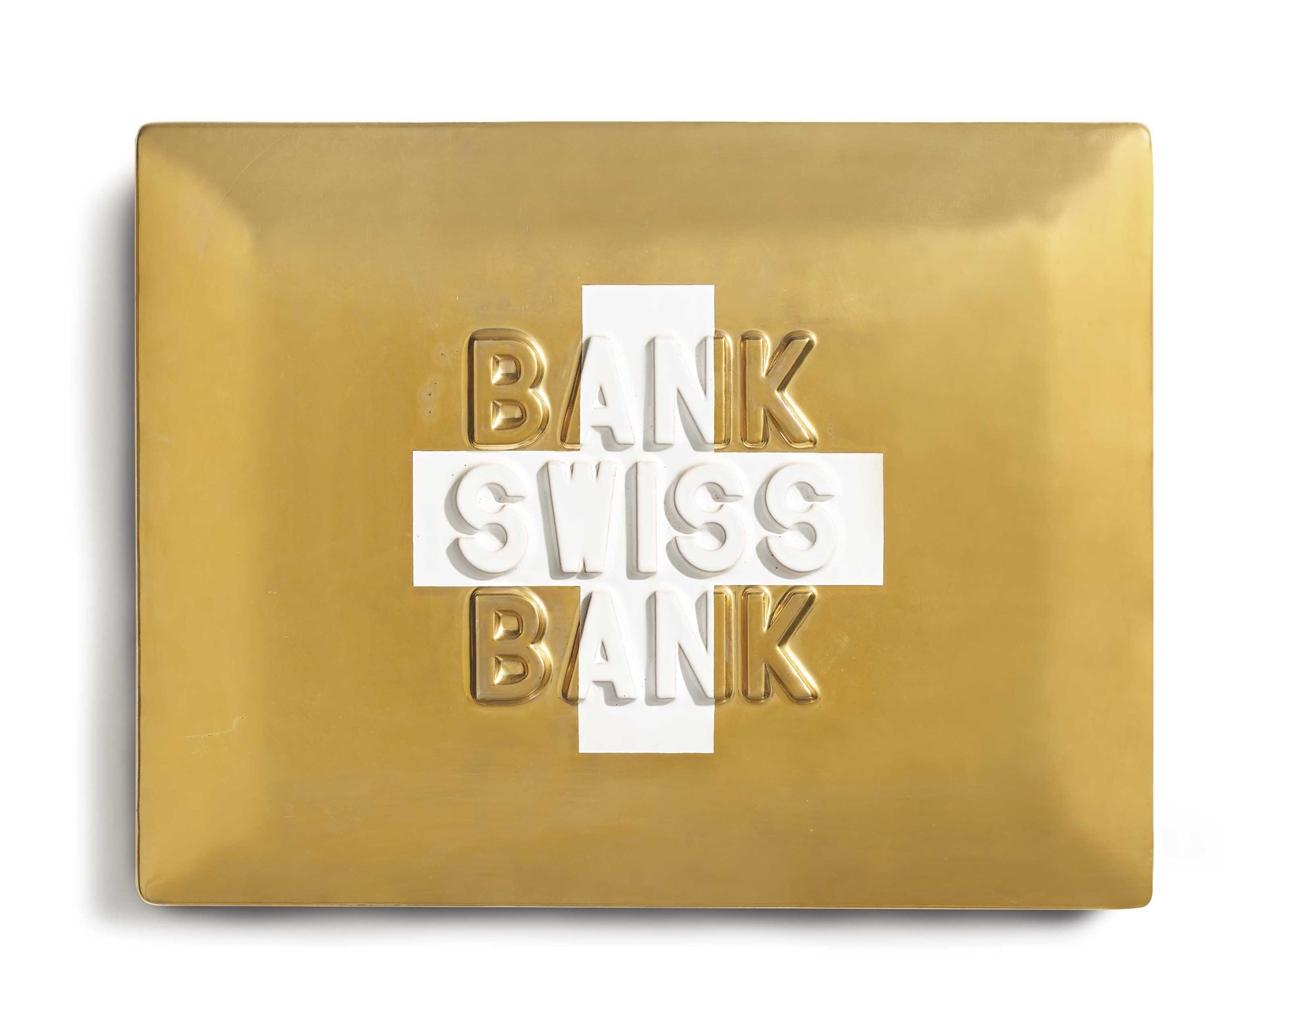 Mario Dellavedova-Bank Swiss Bank-2002